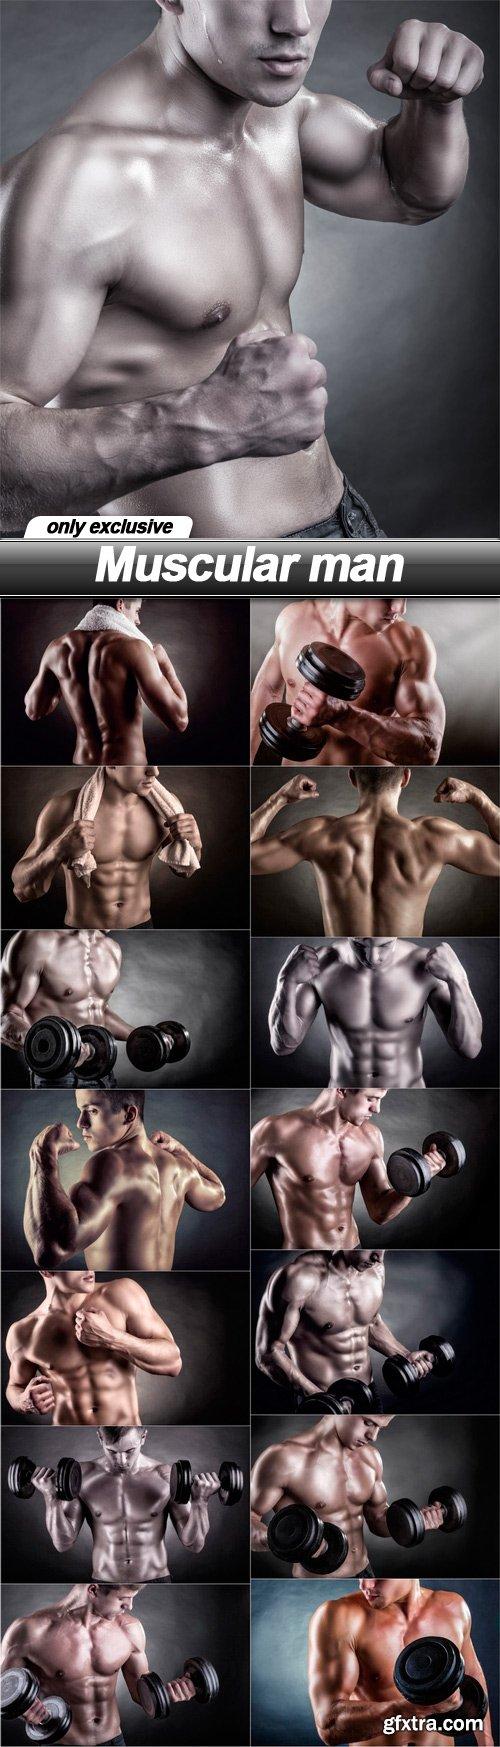 Muscular man - 15 UHQ JPEG